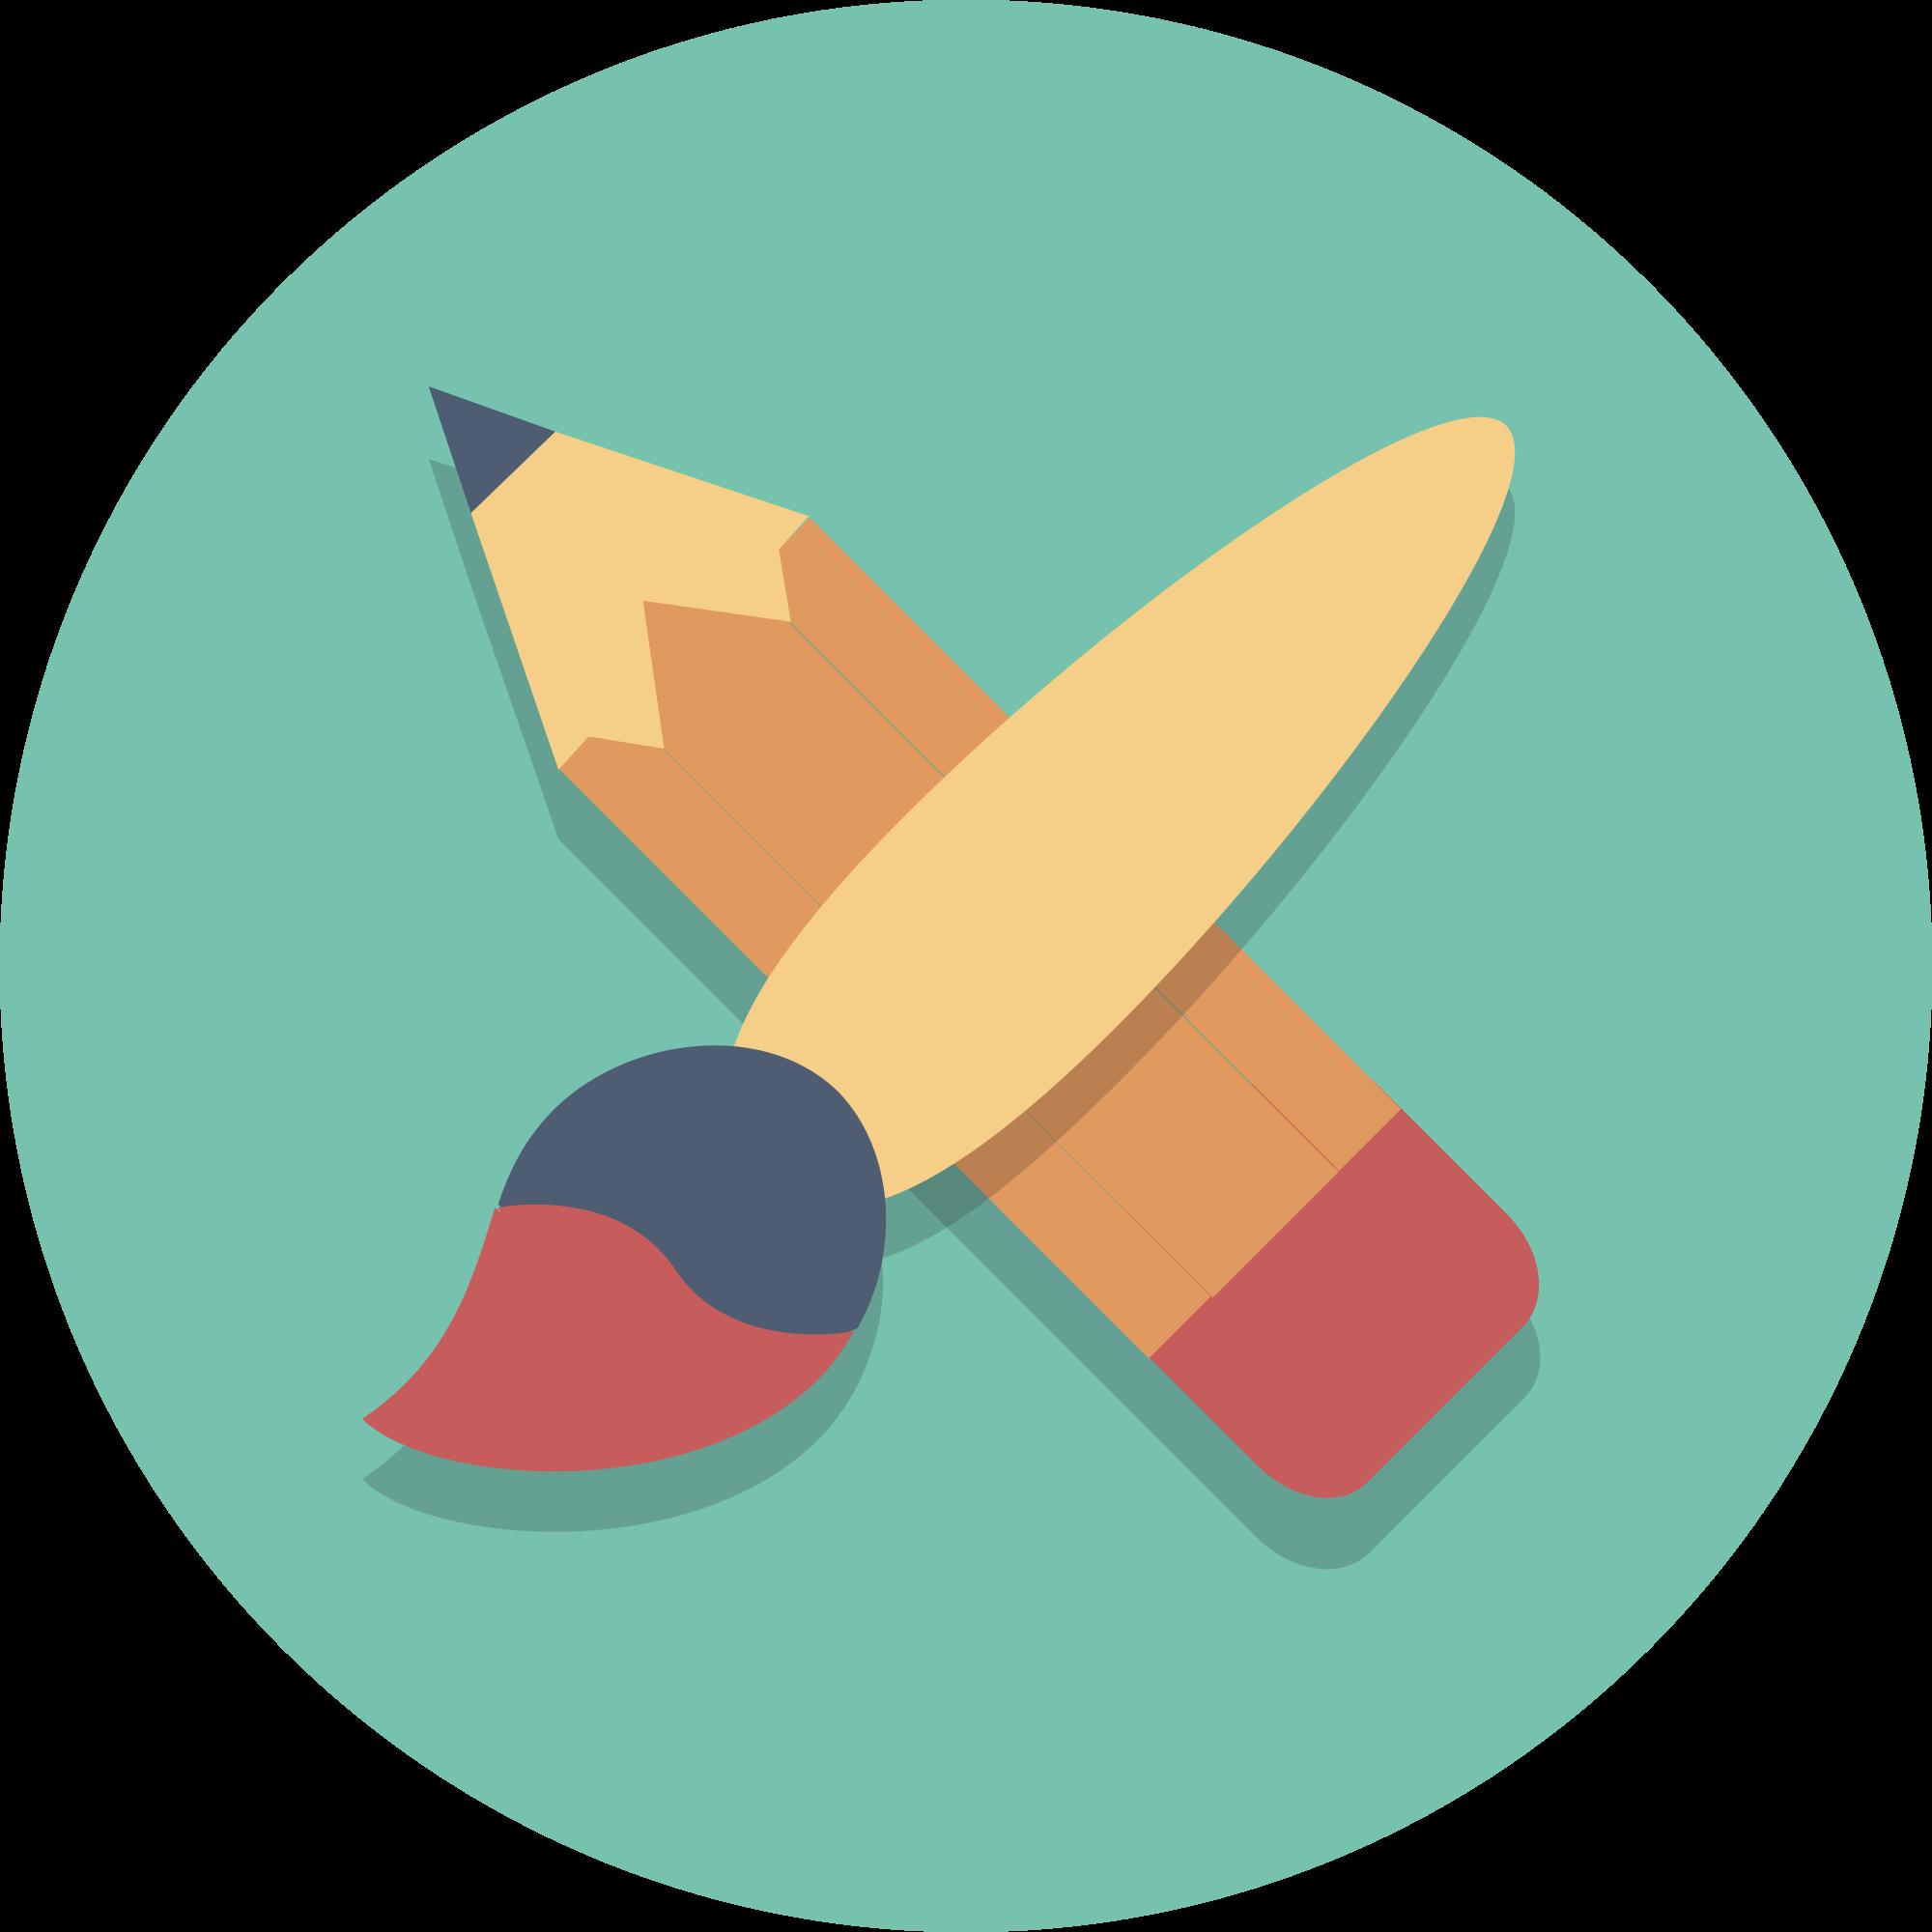 Pencil clipart paintbrush. File circle icons brush